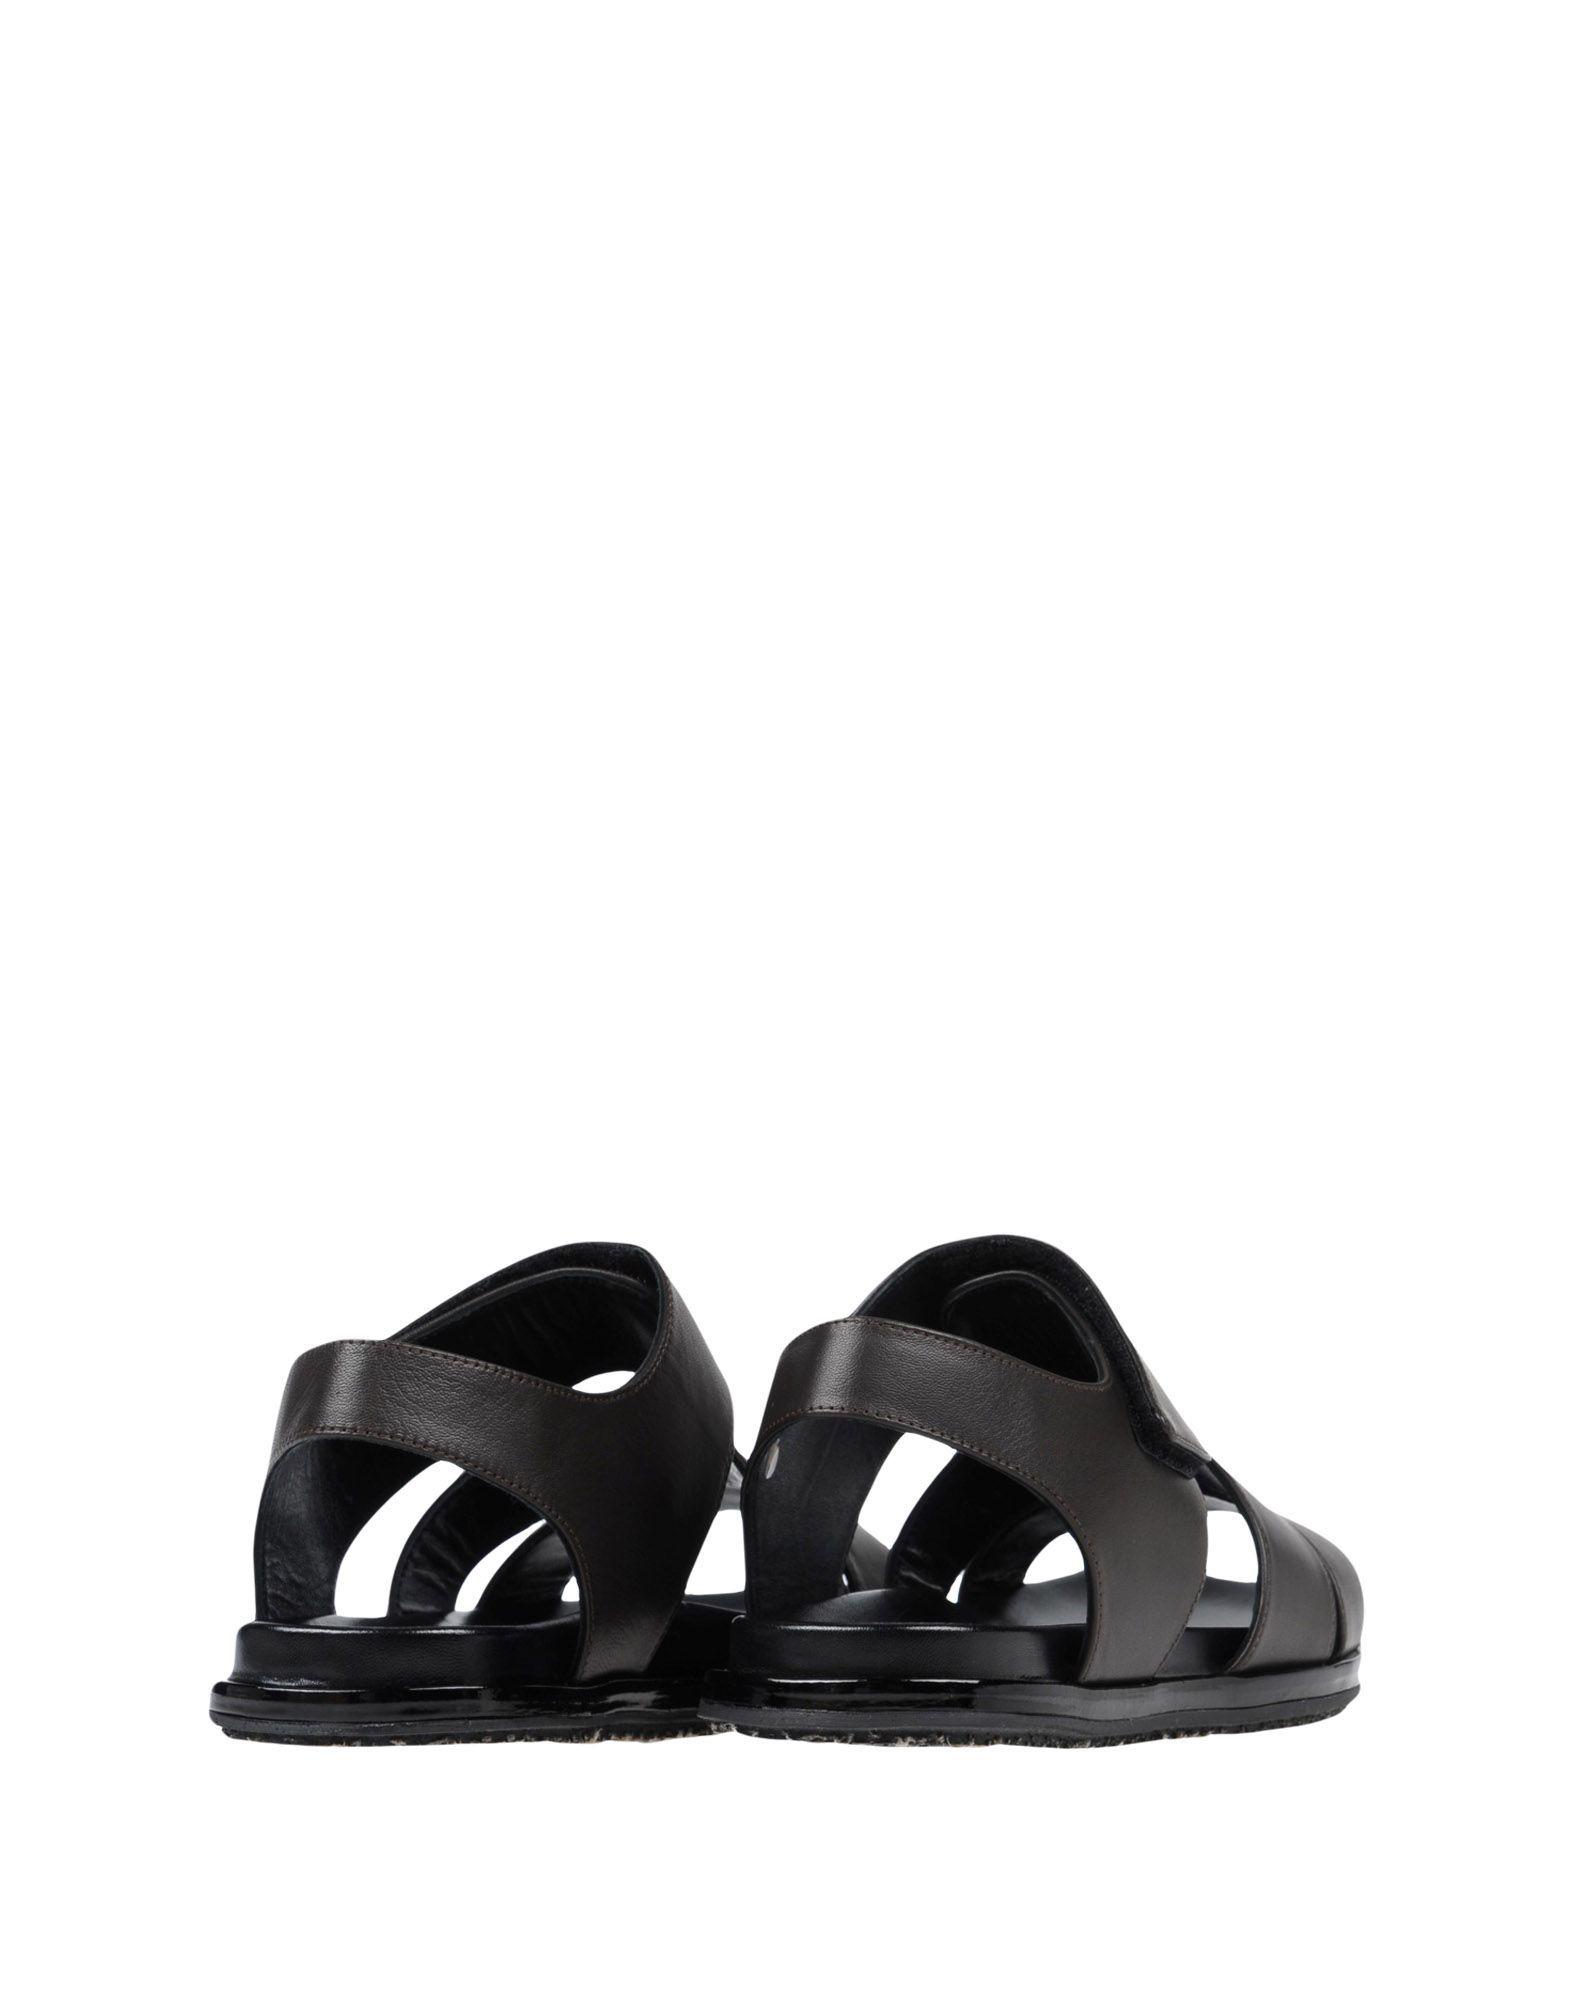 Marni Dark Brown Nappa Leather Sandals